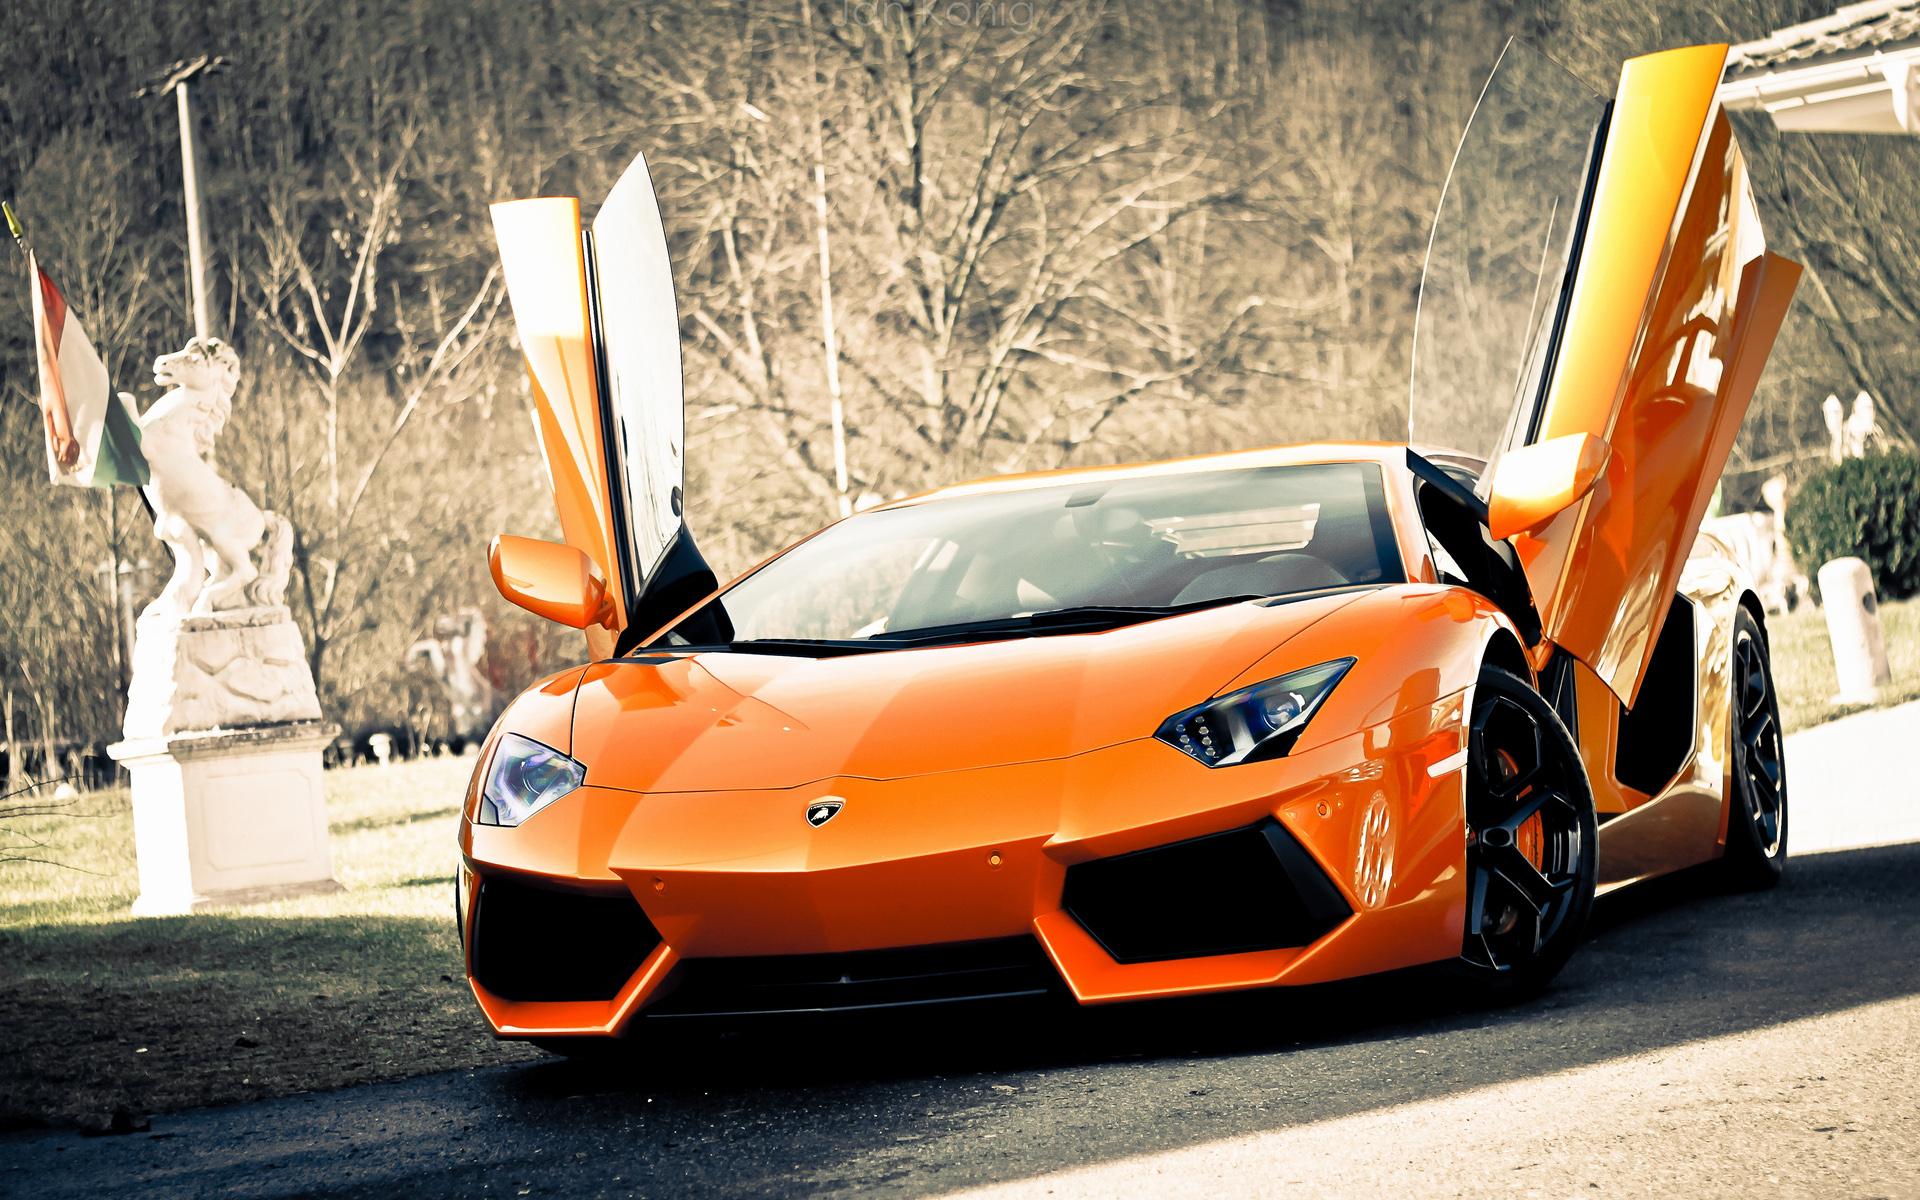 Exotic Hd Car Wallpapers Lamborghini Aventador Wallpaper Hd 2017